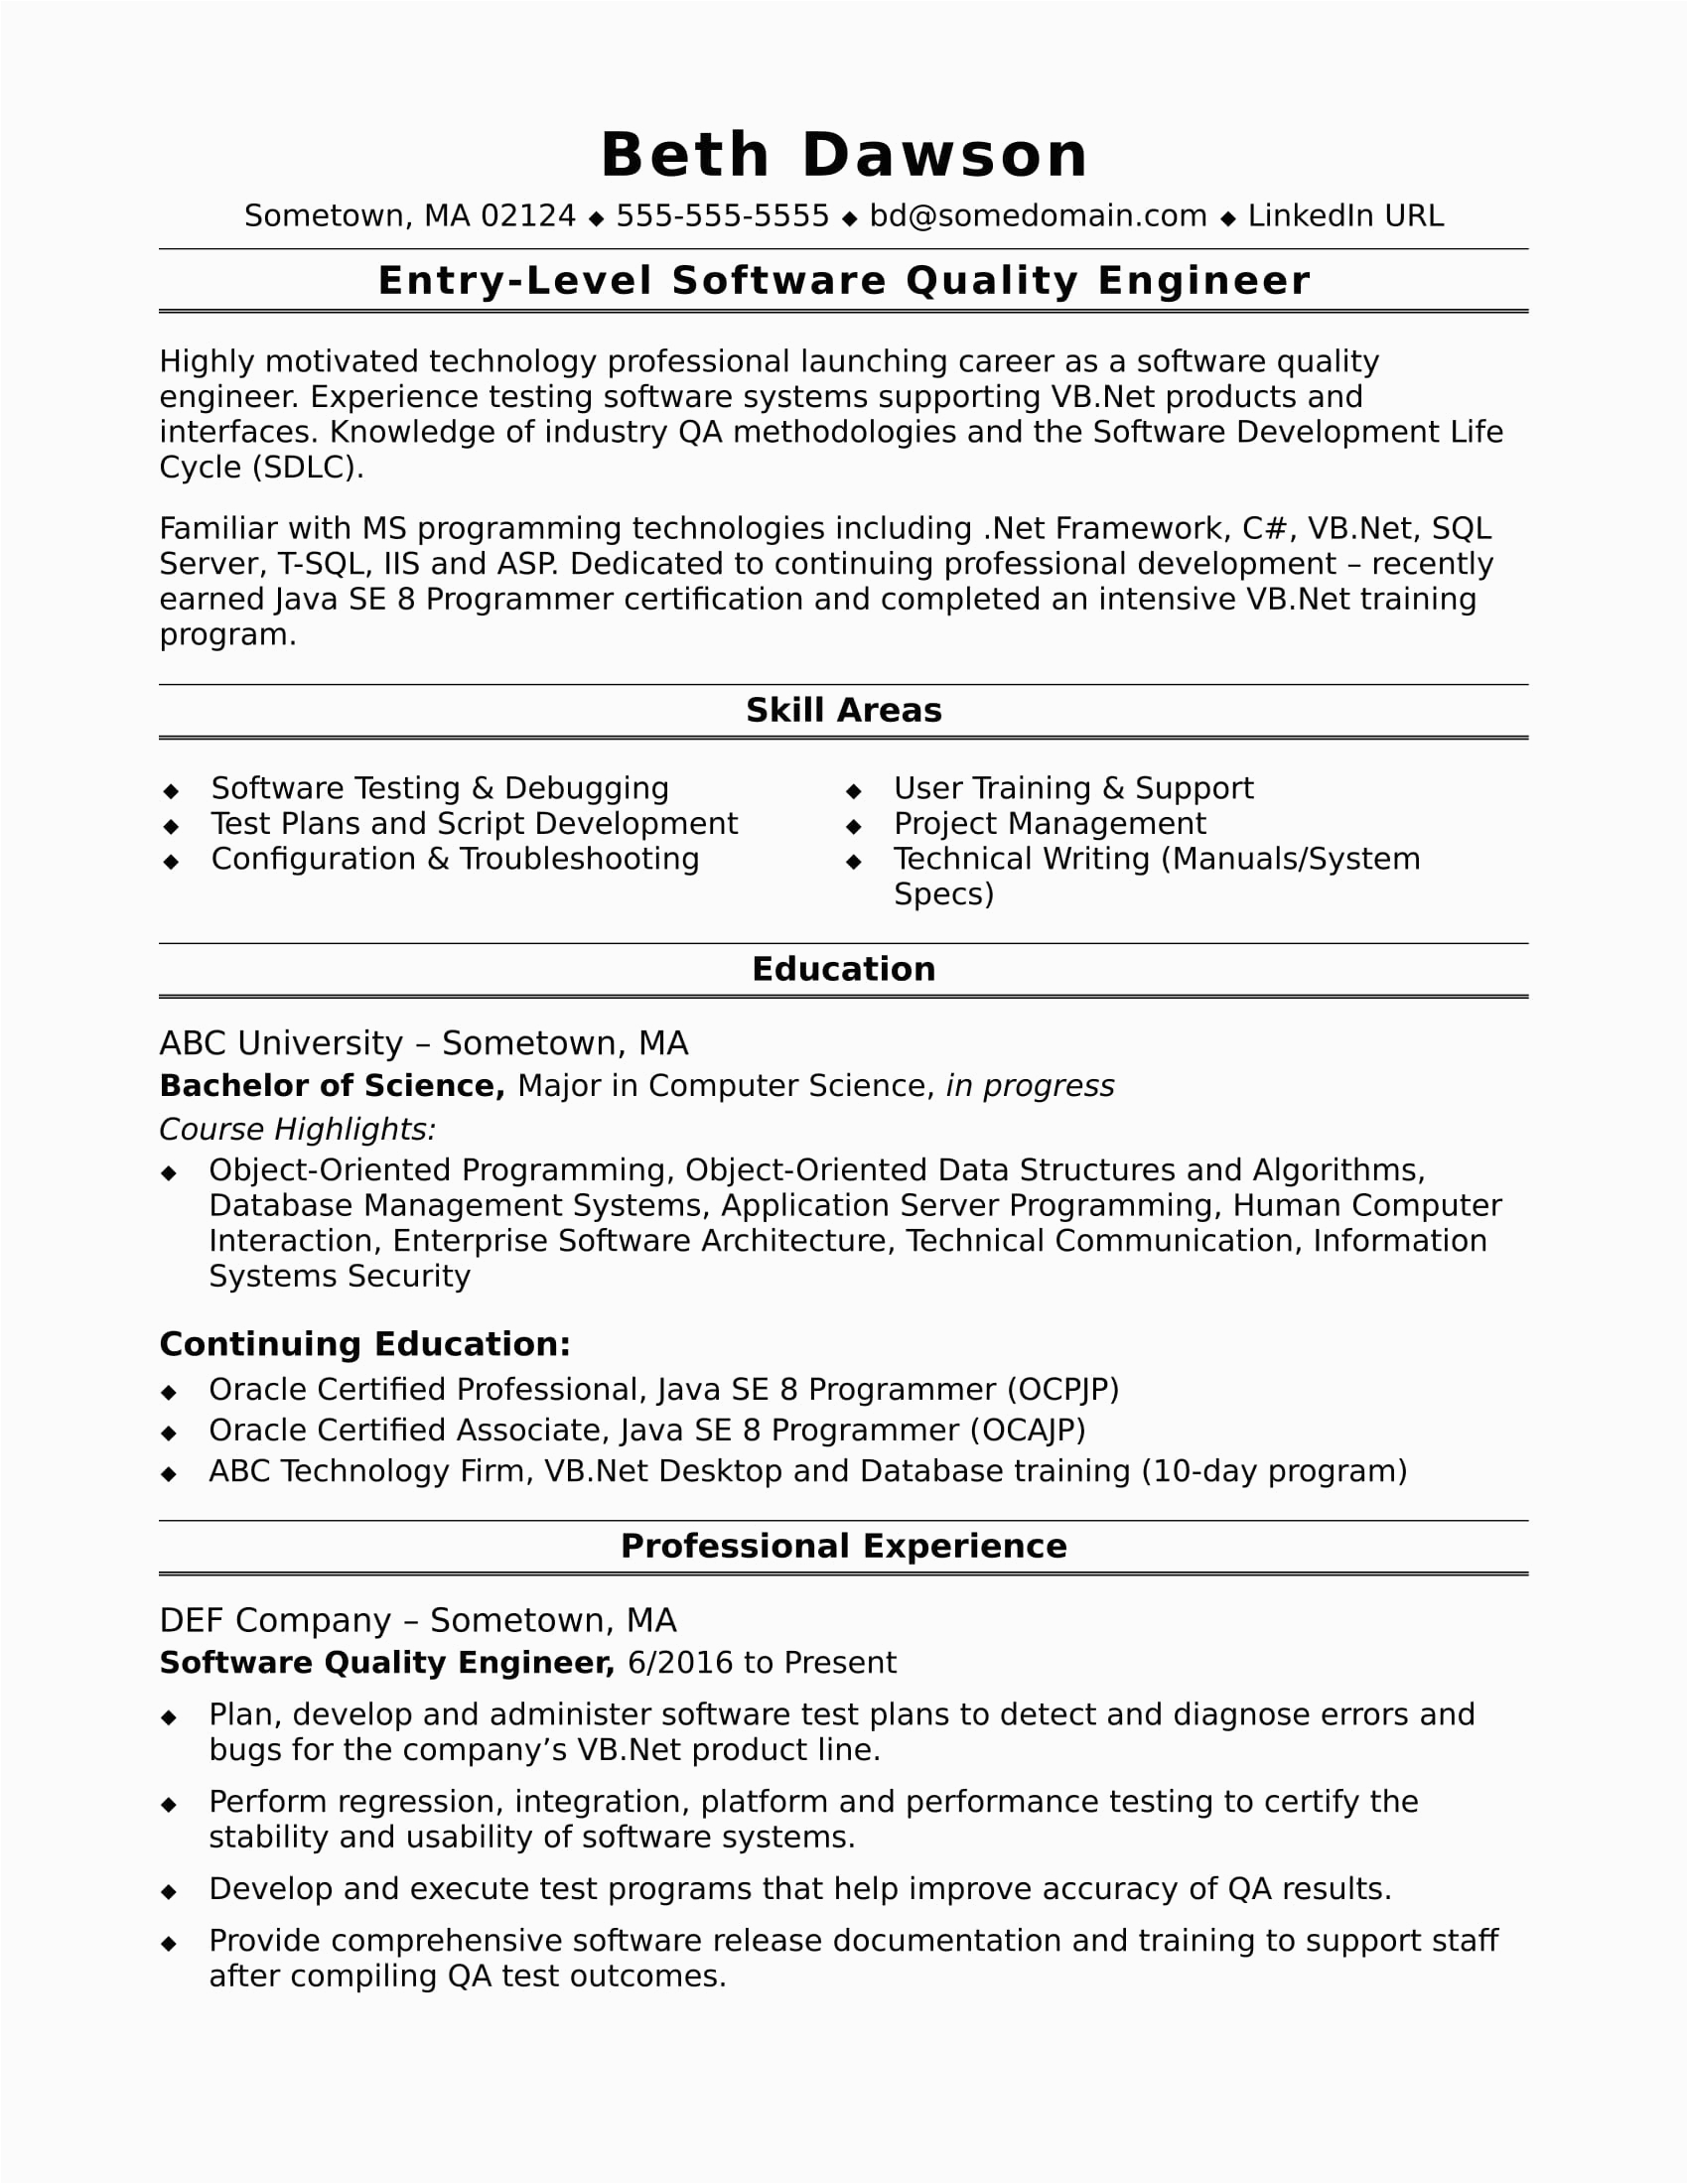 sample resume quality engineer entry level